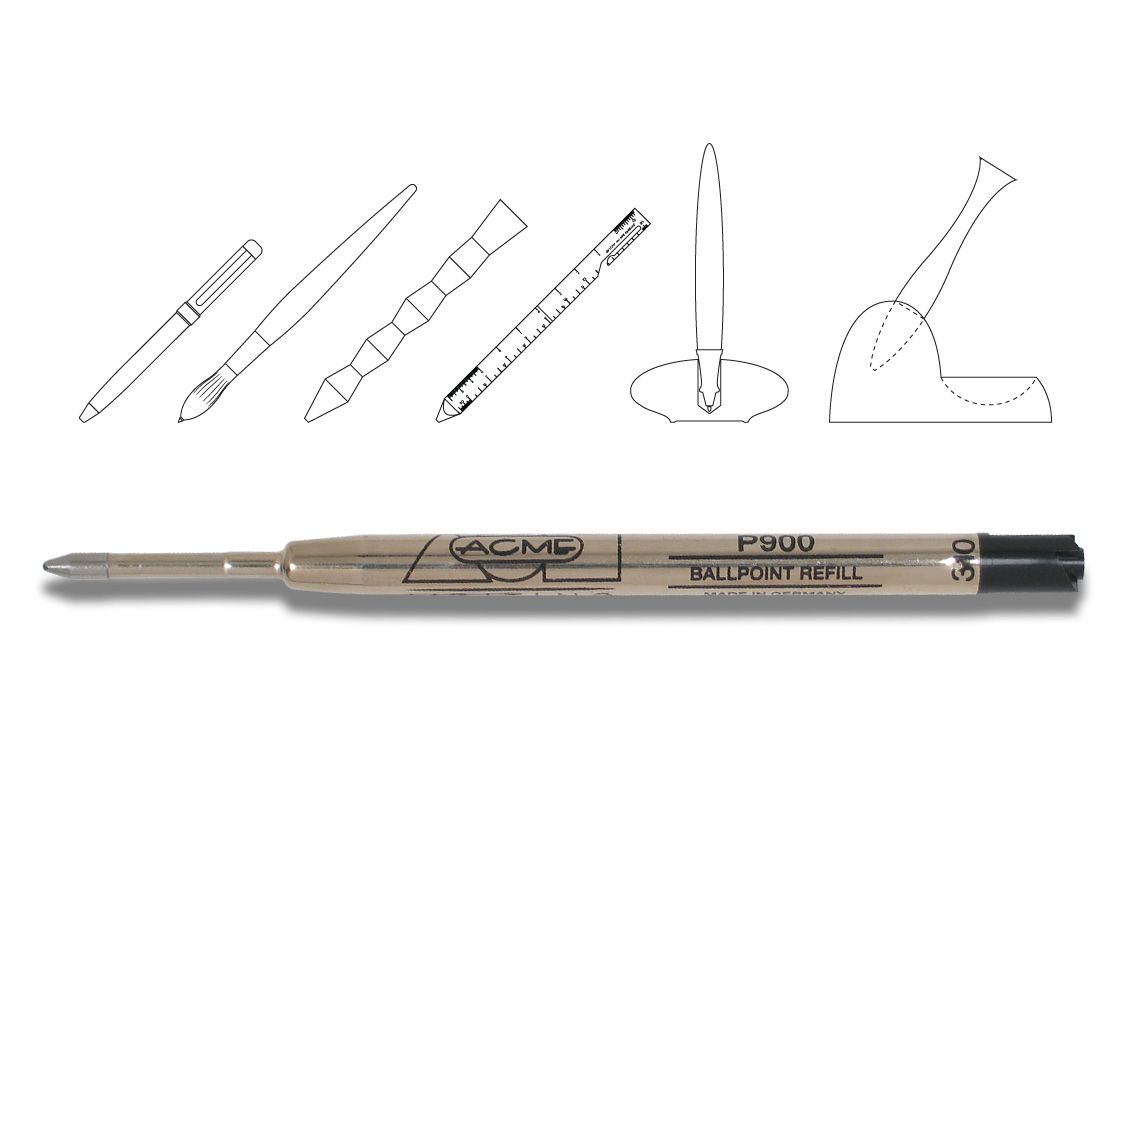 Tool Pen Ballpoint Desk Pen Ballpoint Refill